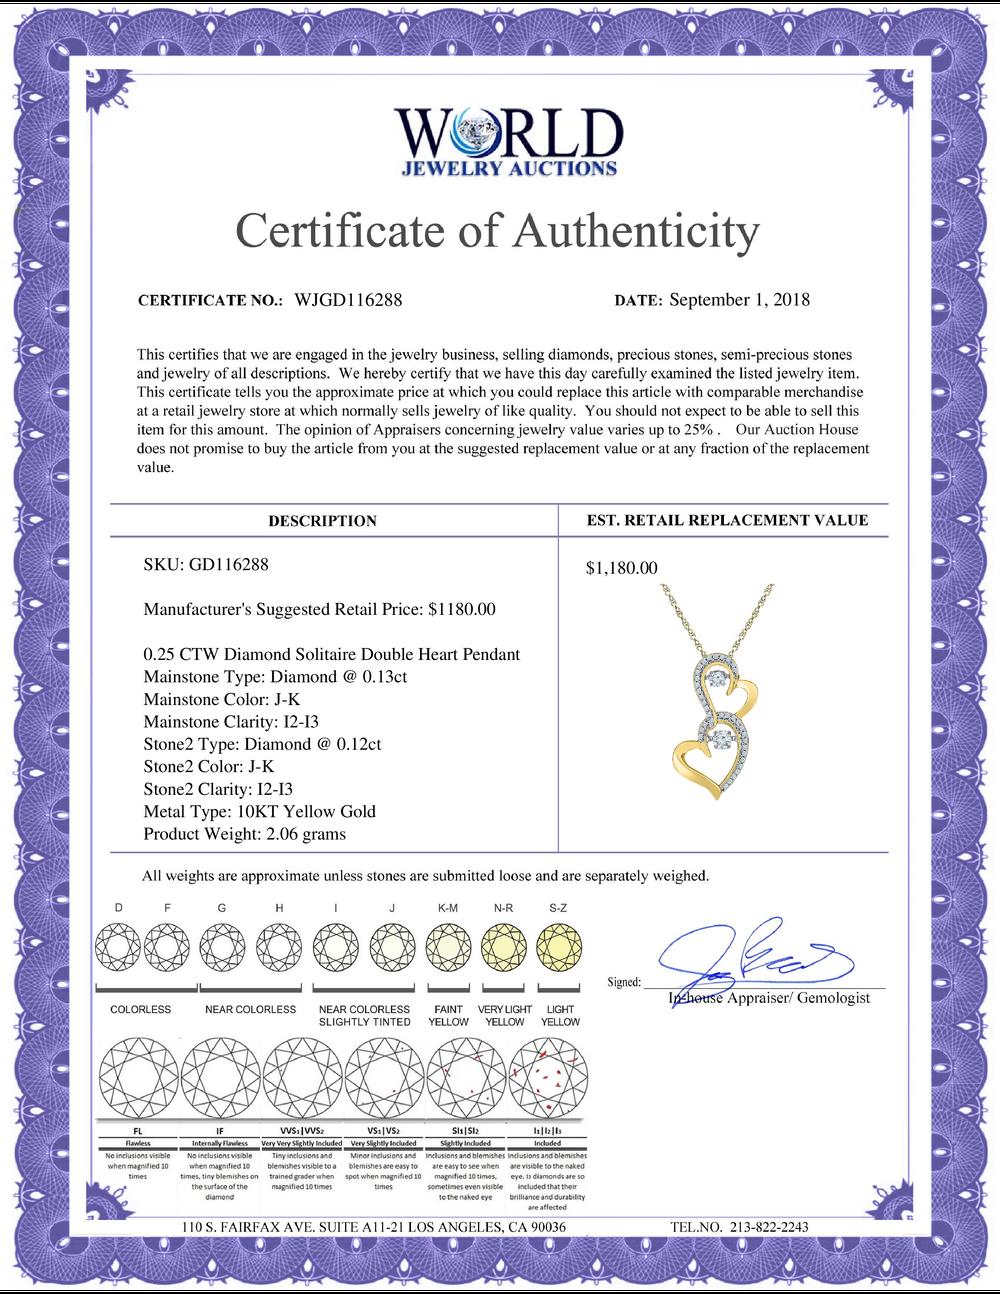 Lot 4193: 0.25 CTW Diamond Solitaire Double Heart Pendant 10KT Yellow Gold - REF-30W2K